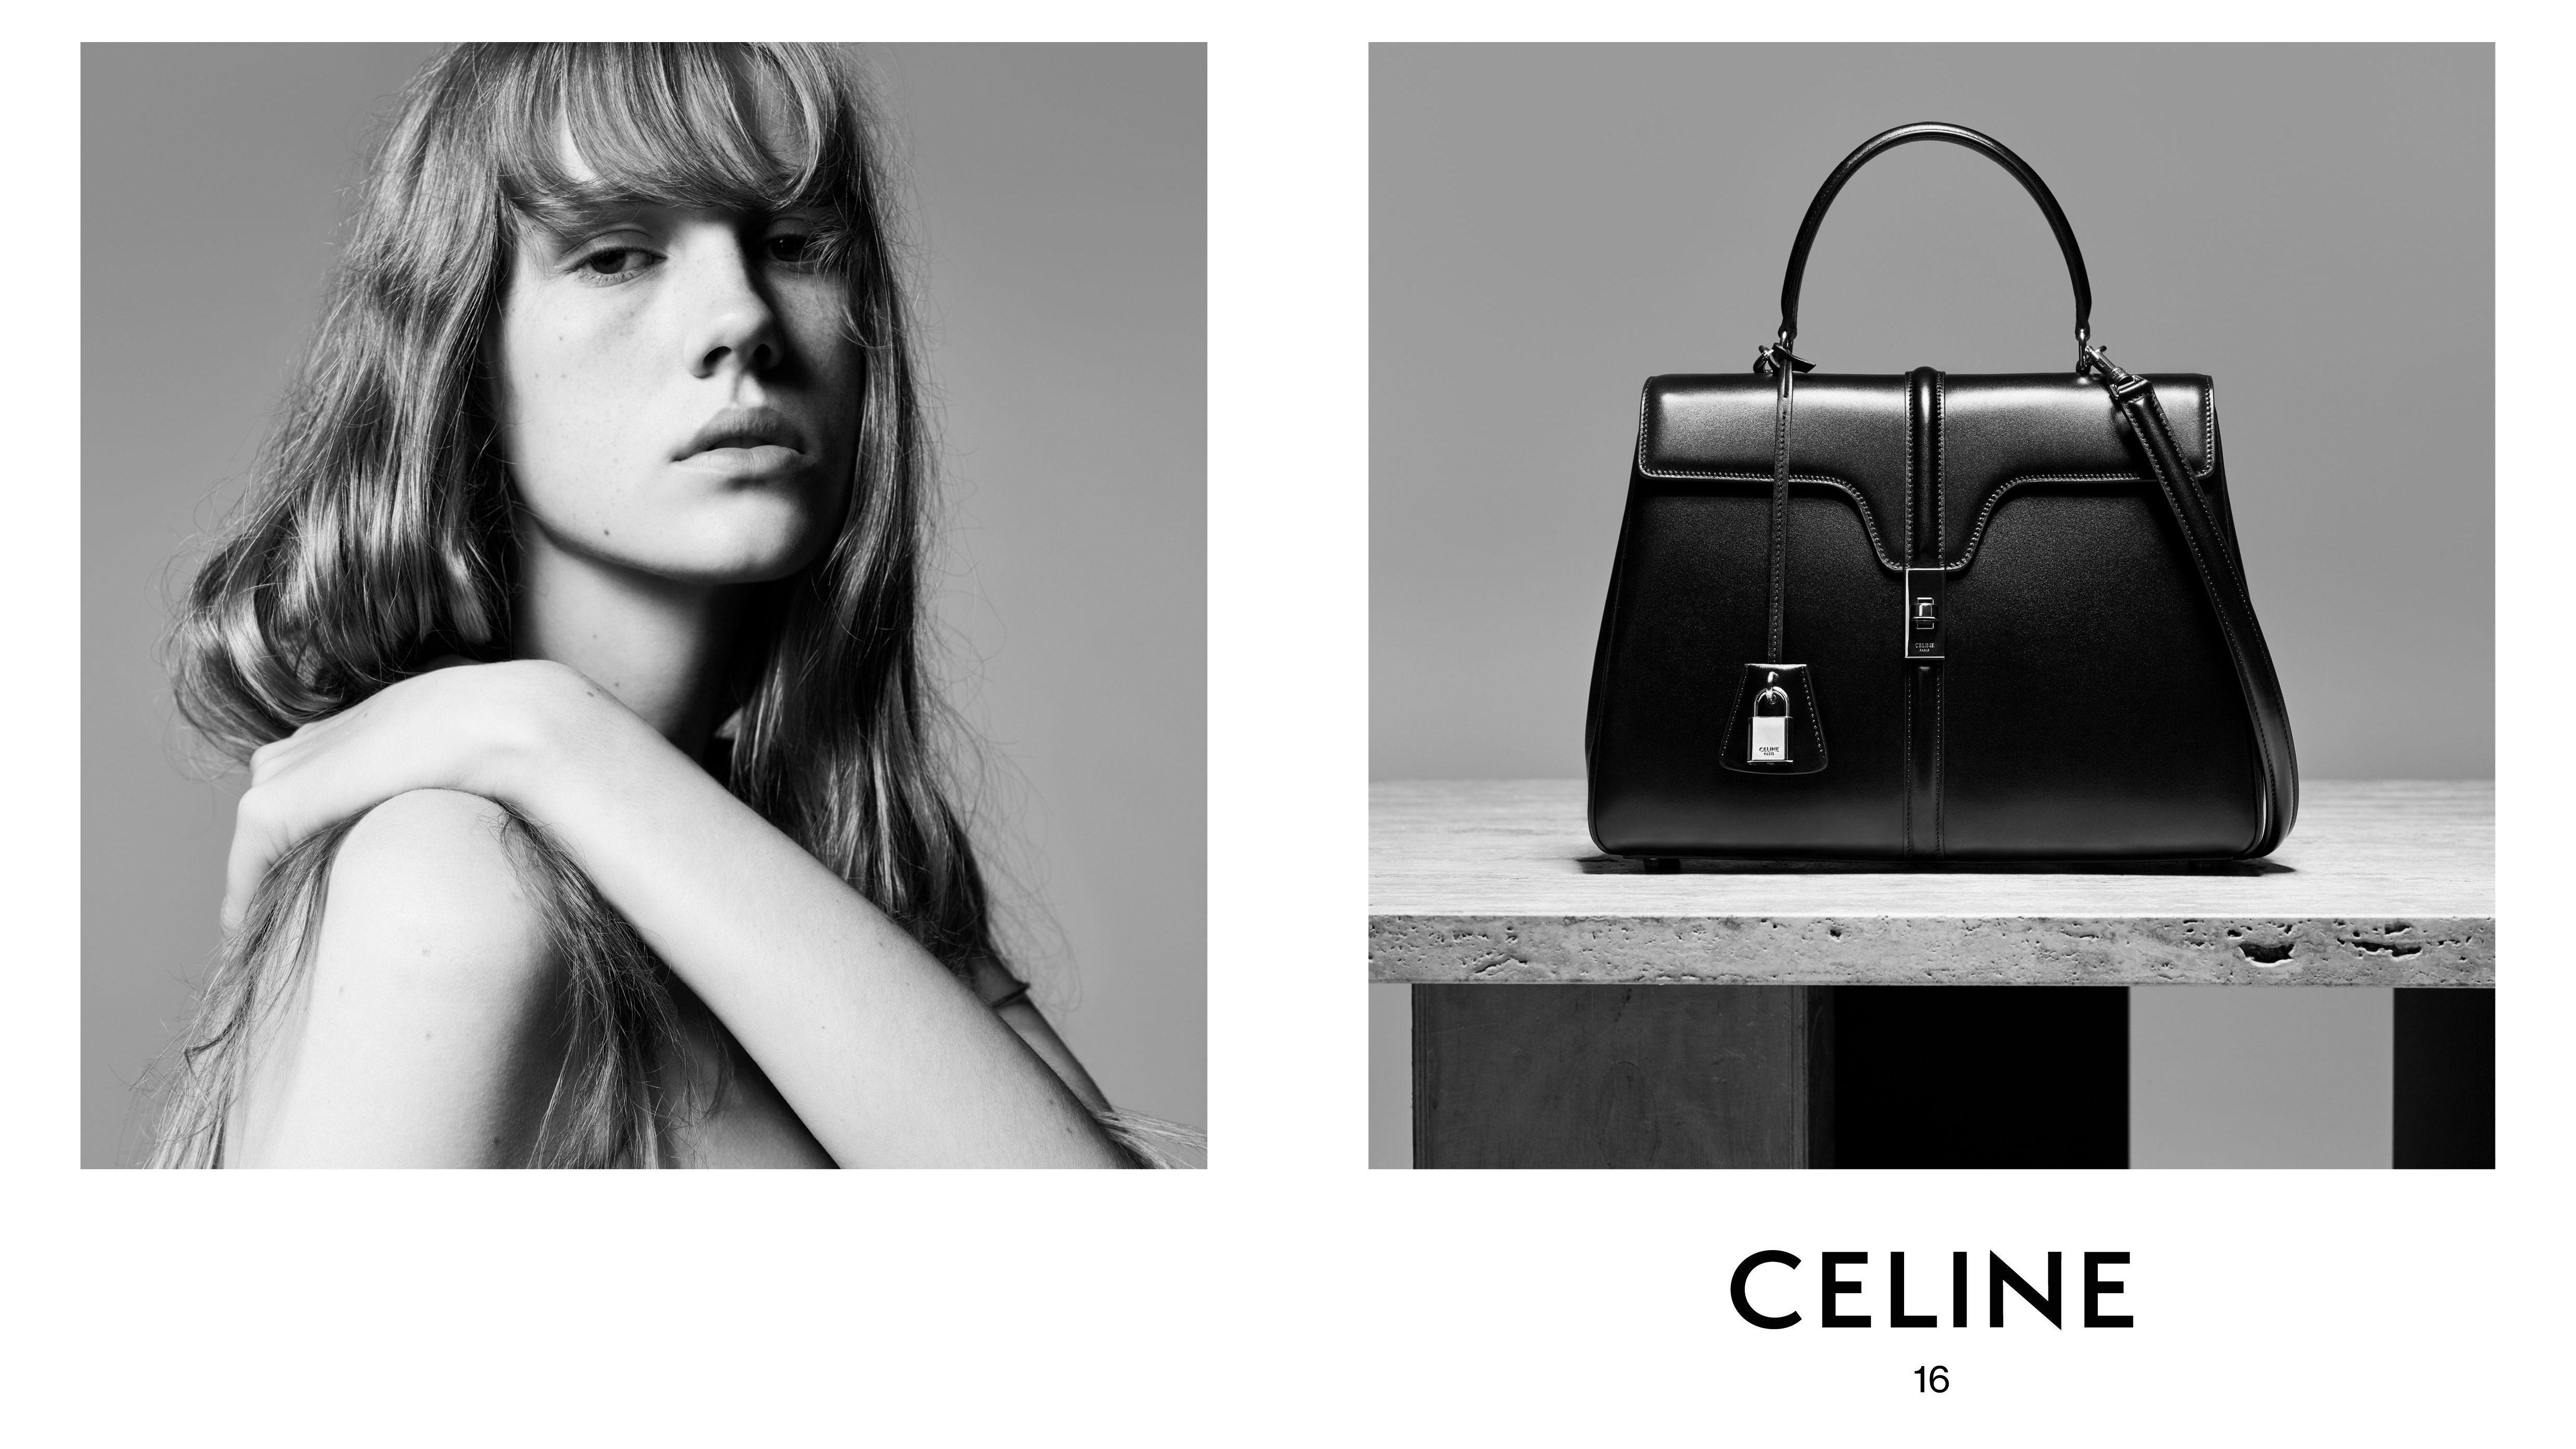 94537ac45421 Hedi Slimane s Celine handbag is already looking like fall s